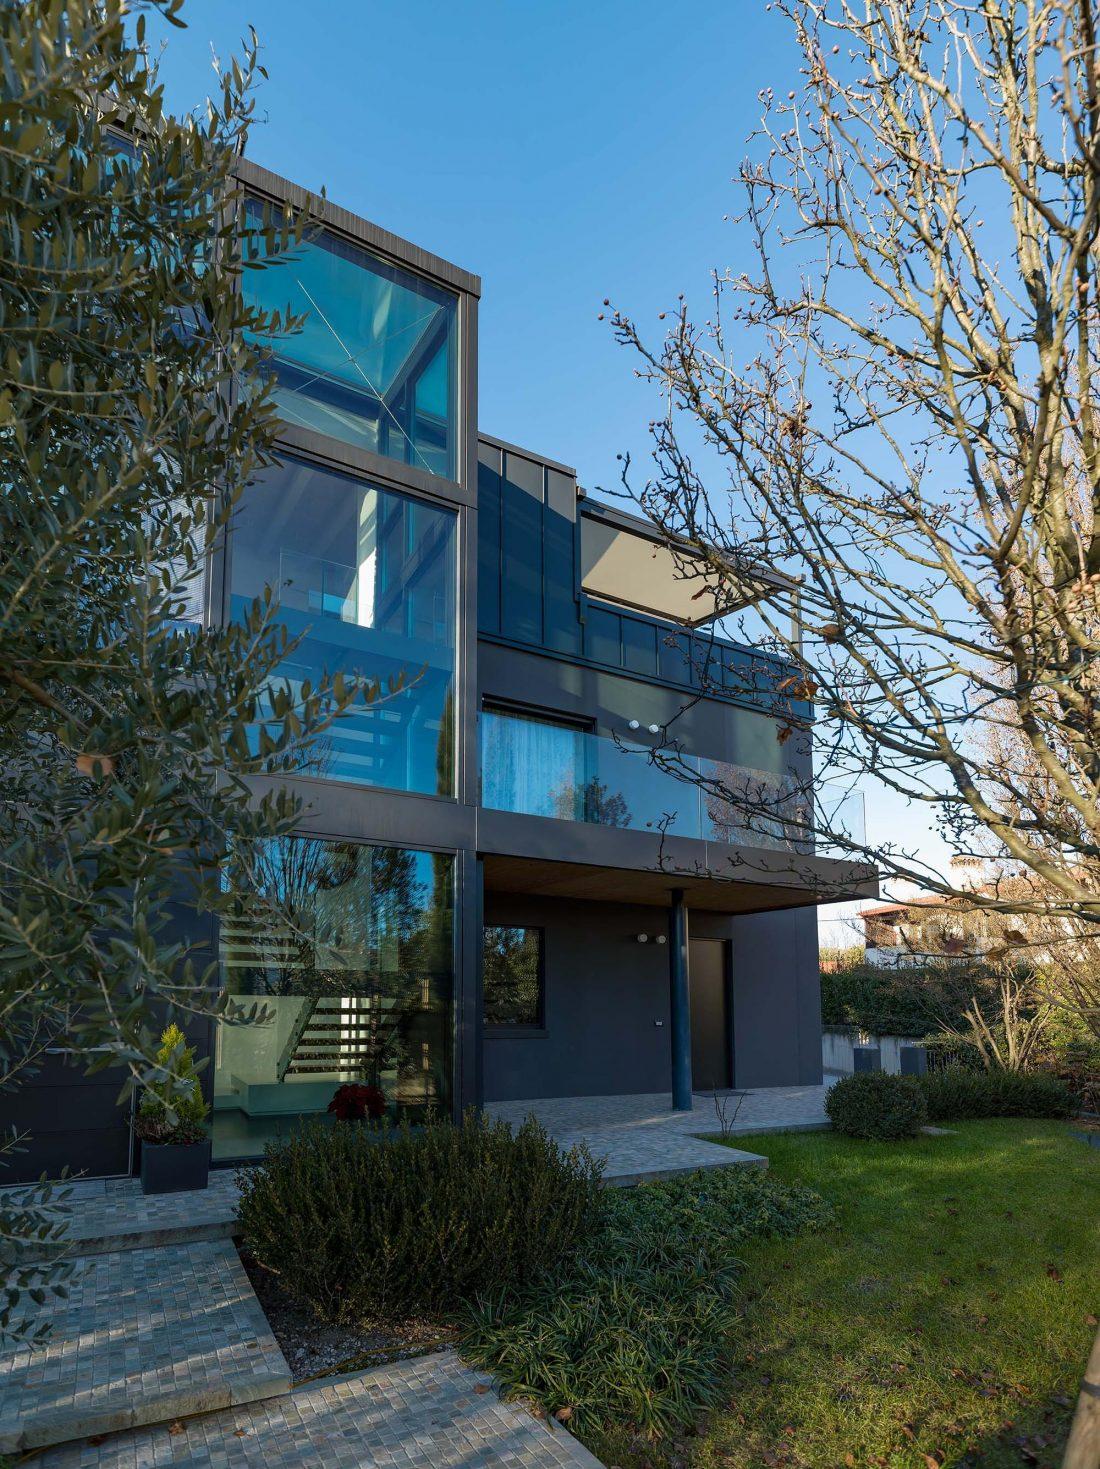 Дом в Порденоне, Италия, от студии Caprioglio Associati Architects 14